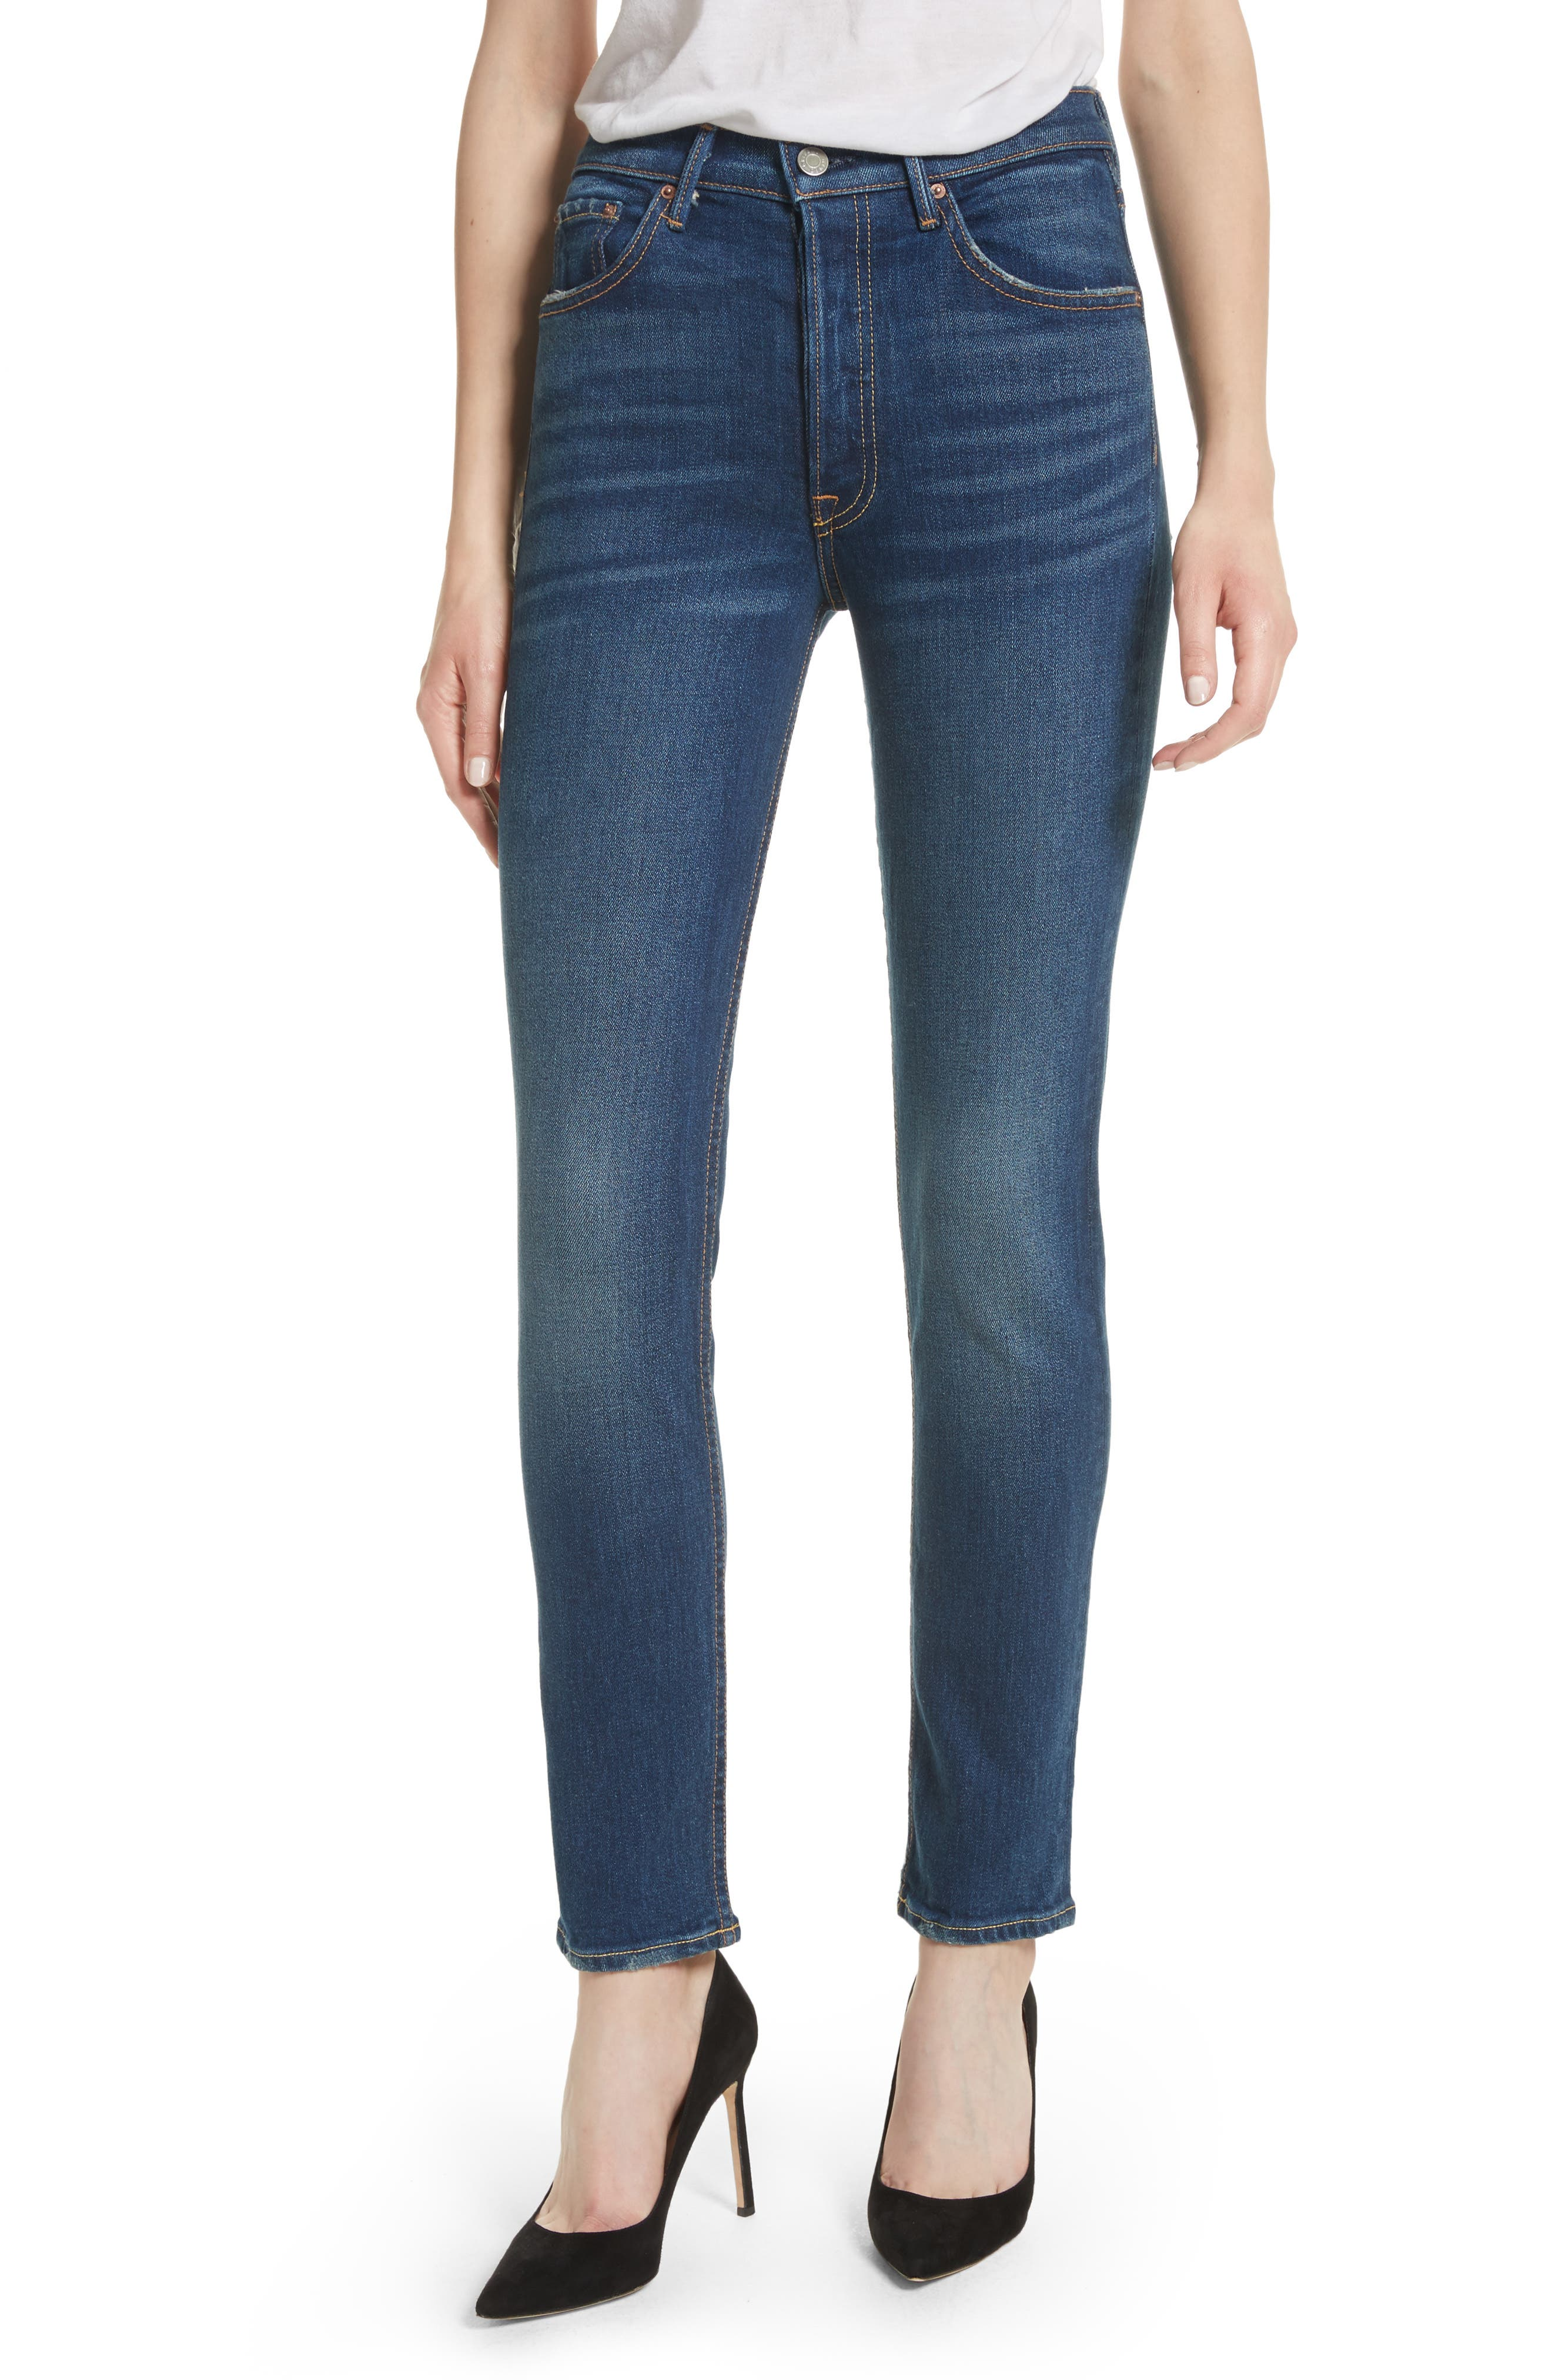 Women's Grlfrnd Karolina High Waist Skinny Jeans